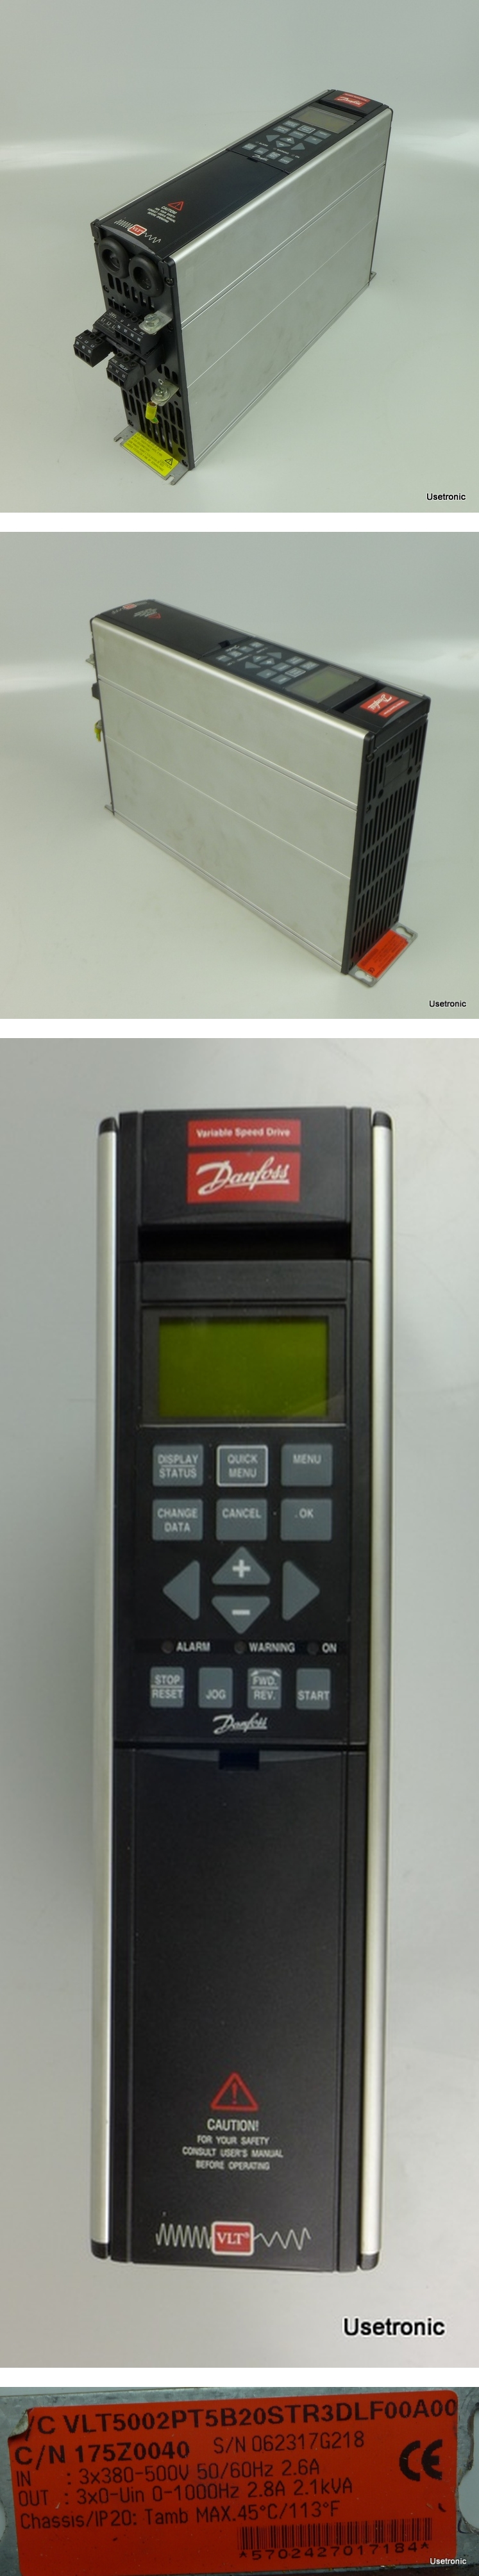 Danfoss VLT5002